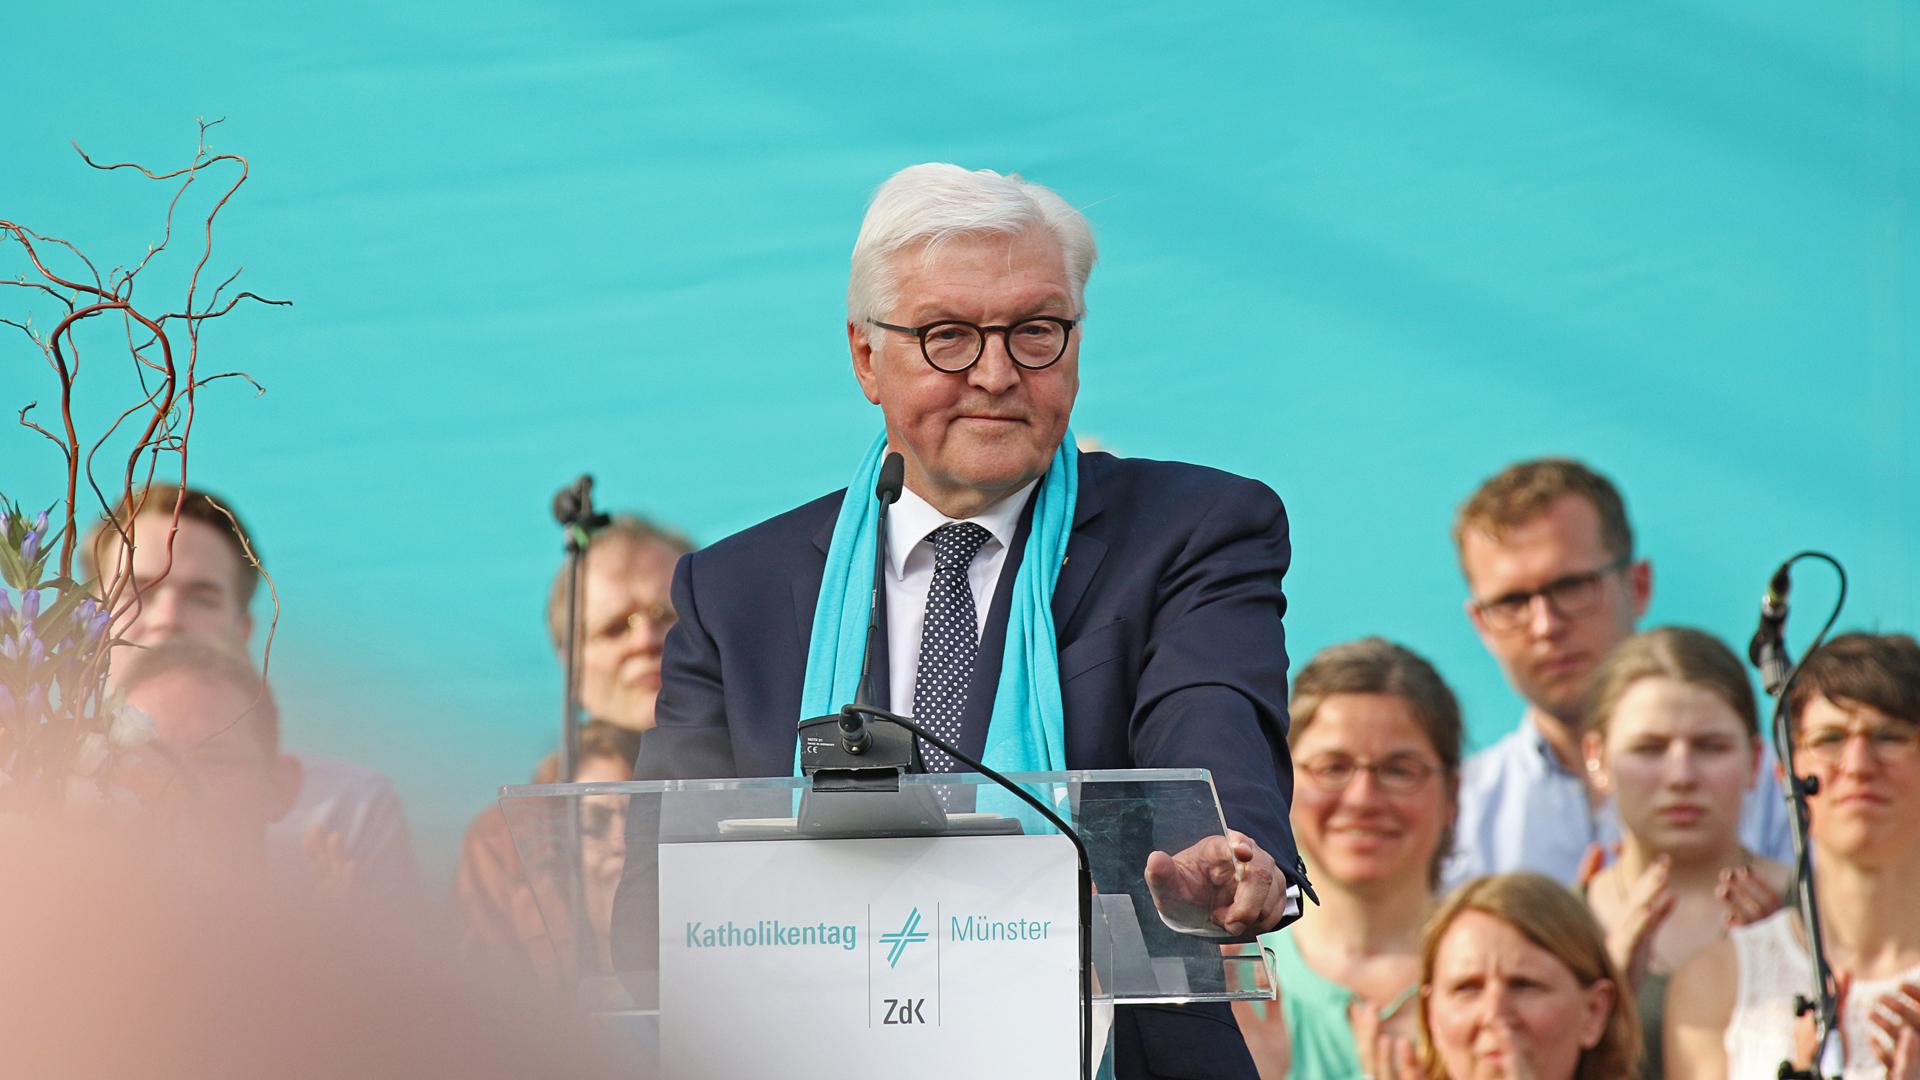 Bundespräsident Steinmeier beim Katholikentag in Münster